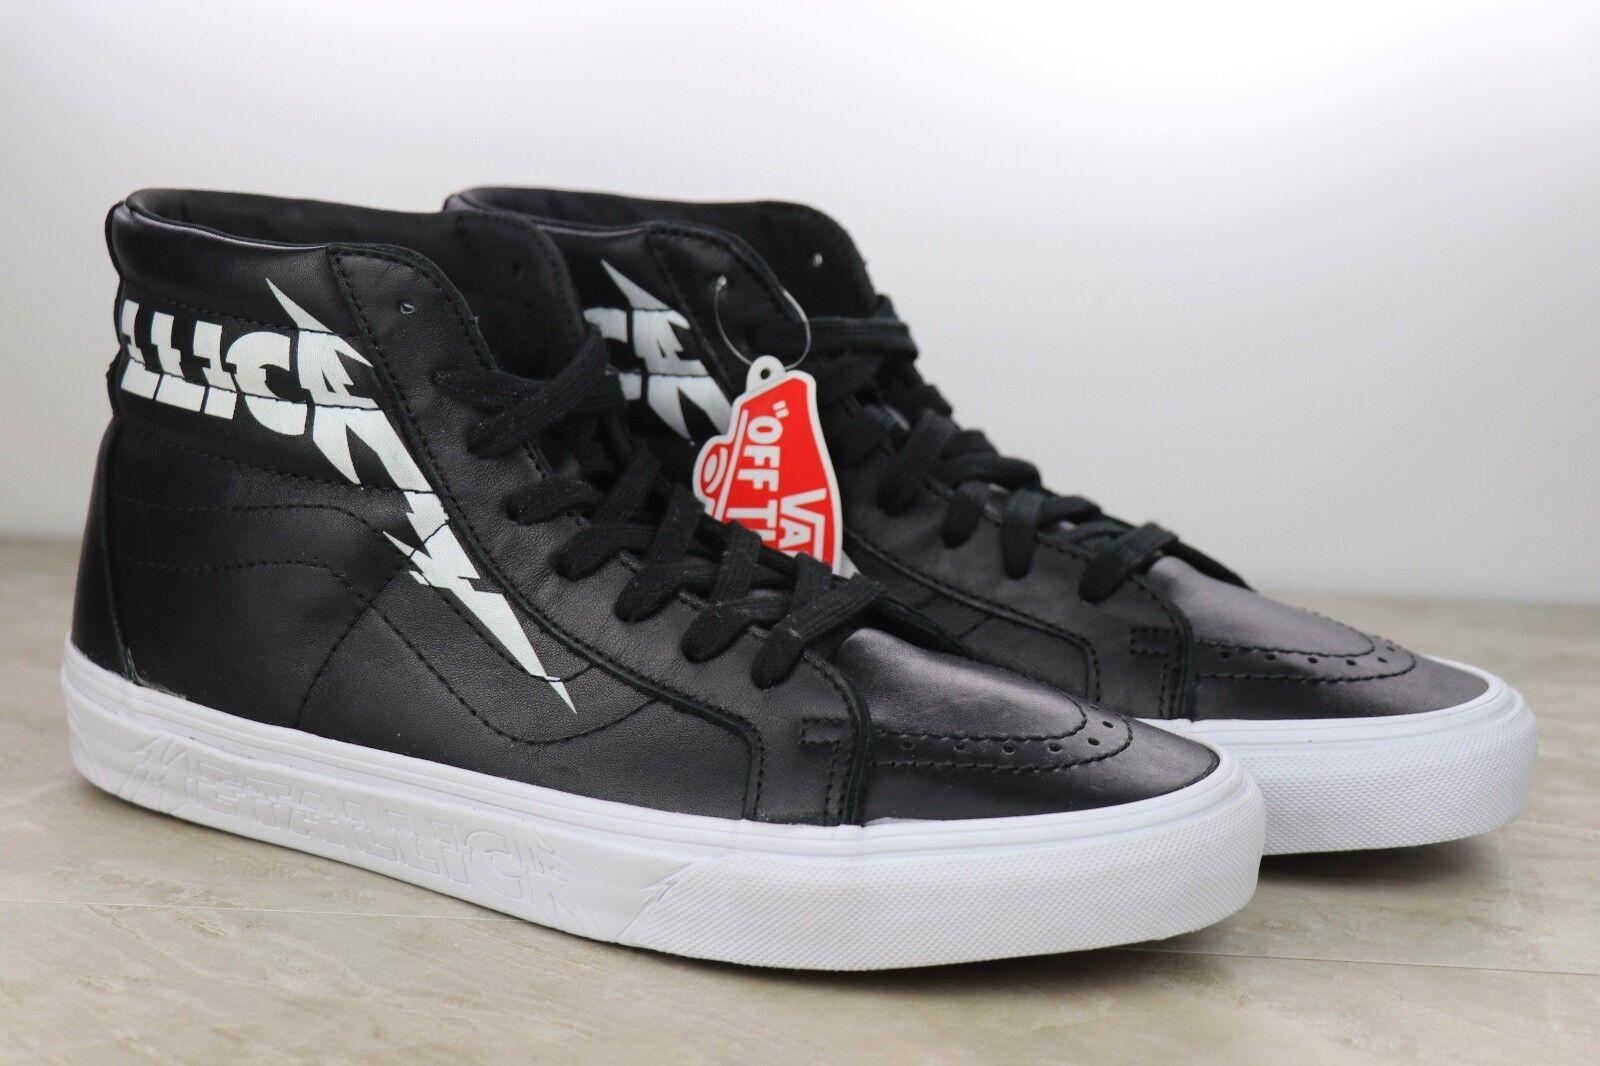 Vans Metallica SK8-Hi Reissue Black White Kirk Hammett Mens Shoes NIB Multi Size